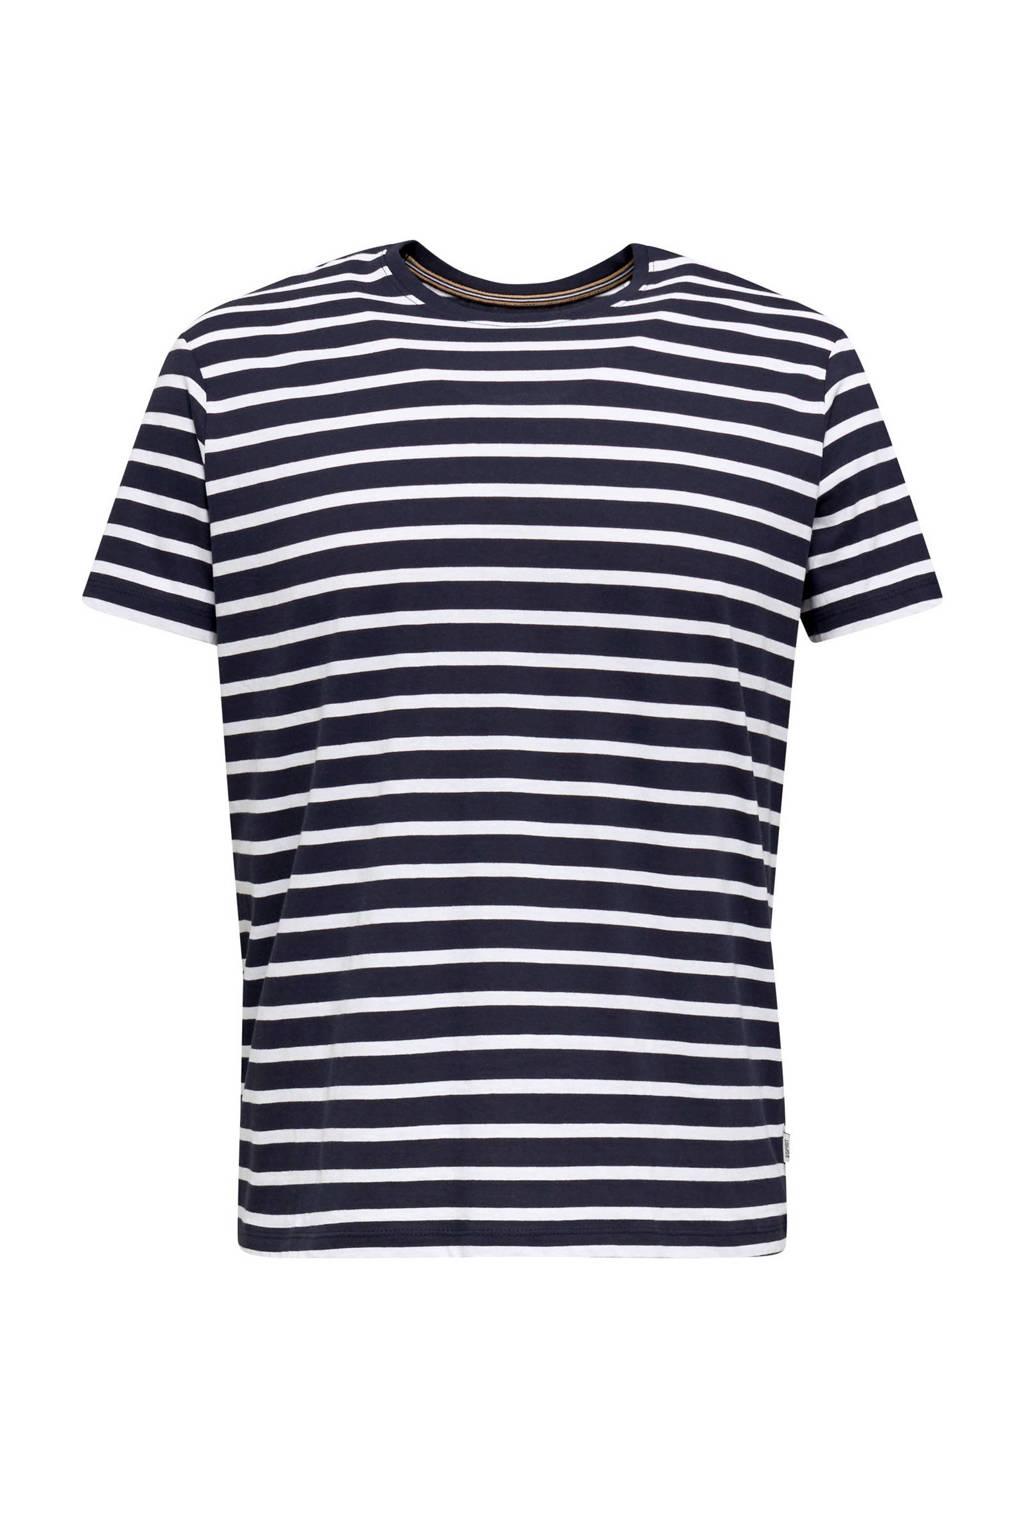 ESPRIT Men Casual gestreept T-shirt marine/wit, Marine/wit